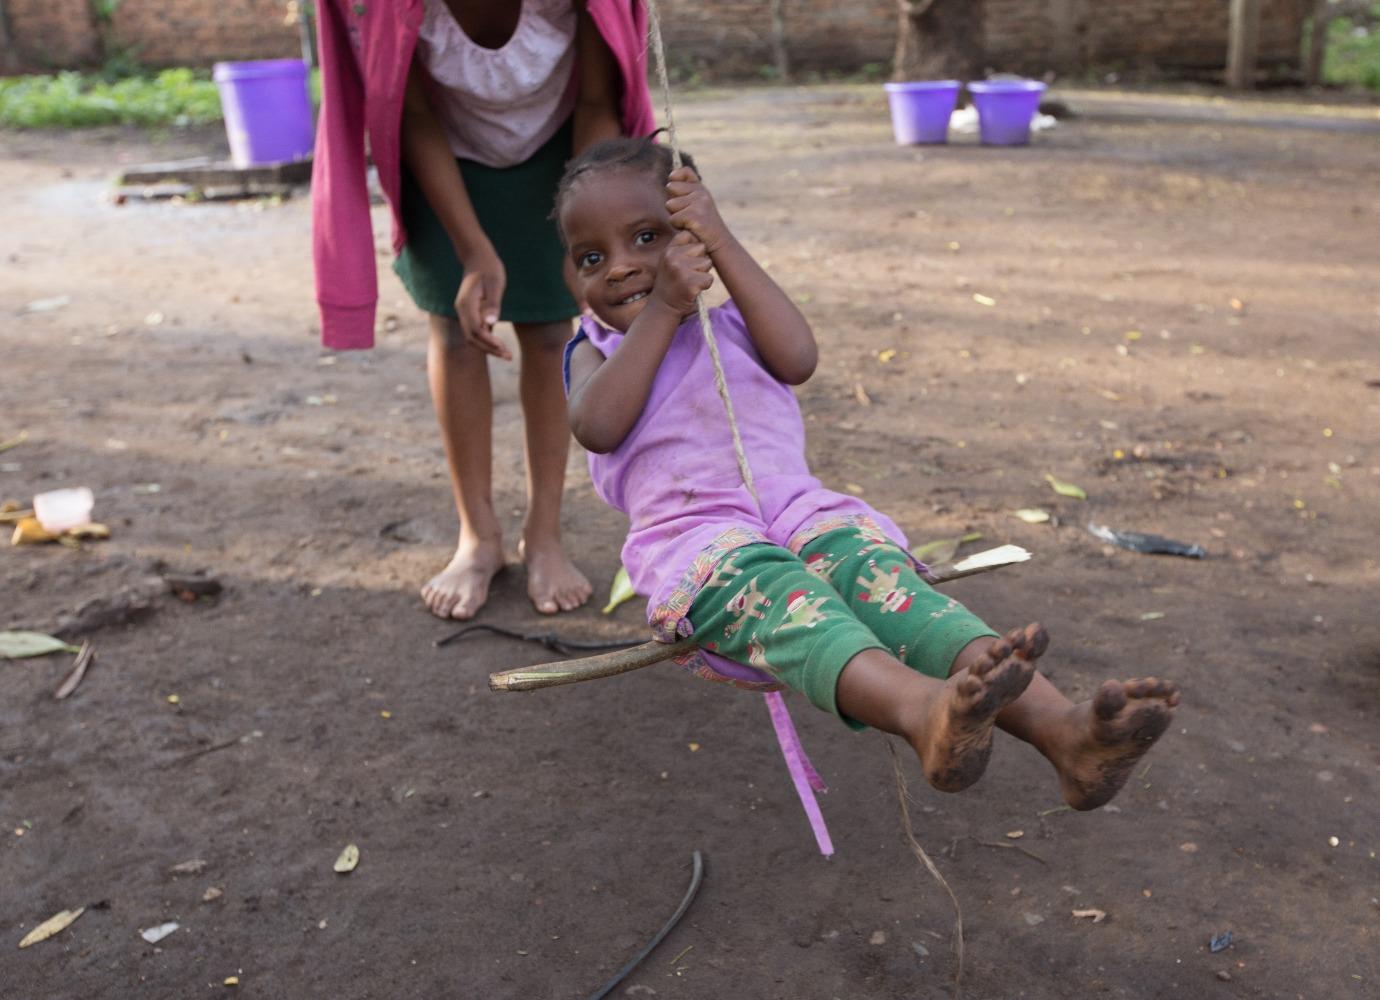 Ugandan child smiling and swinging